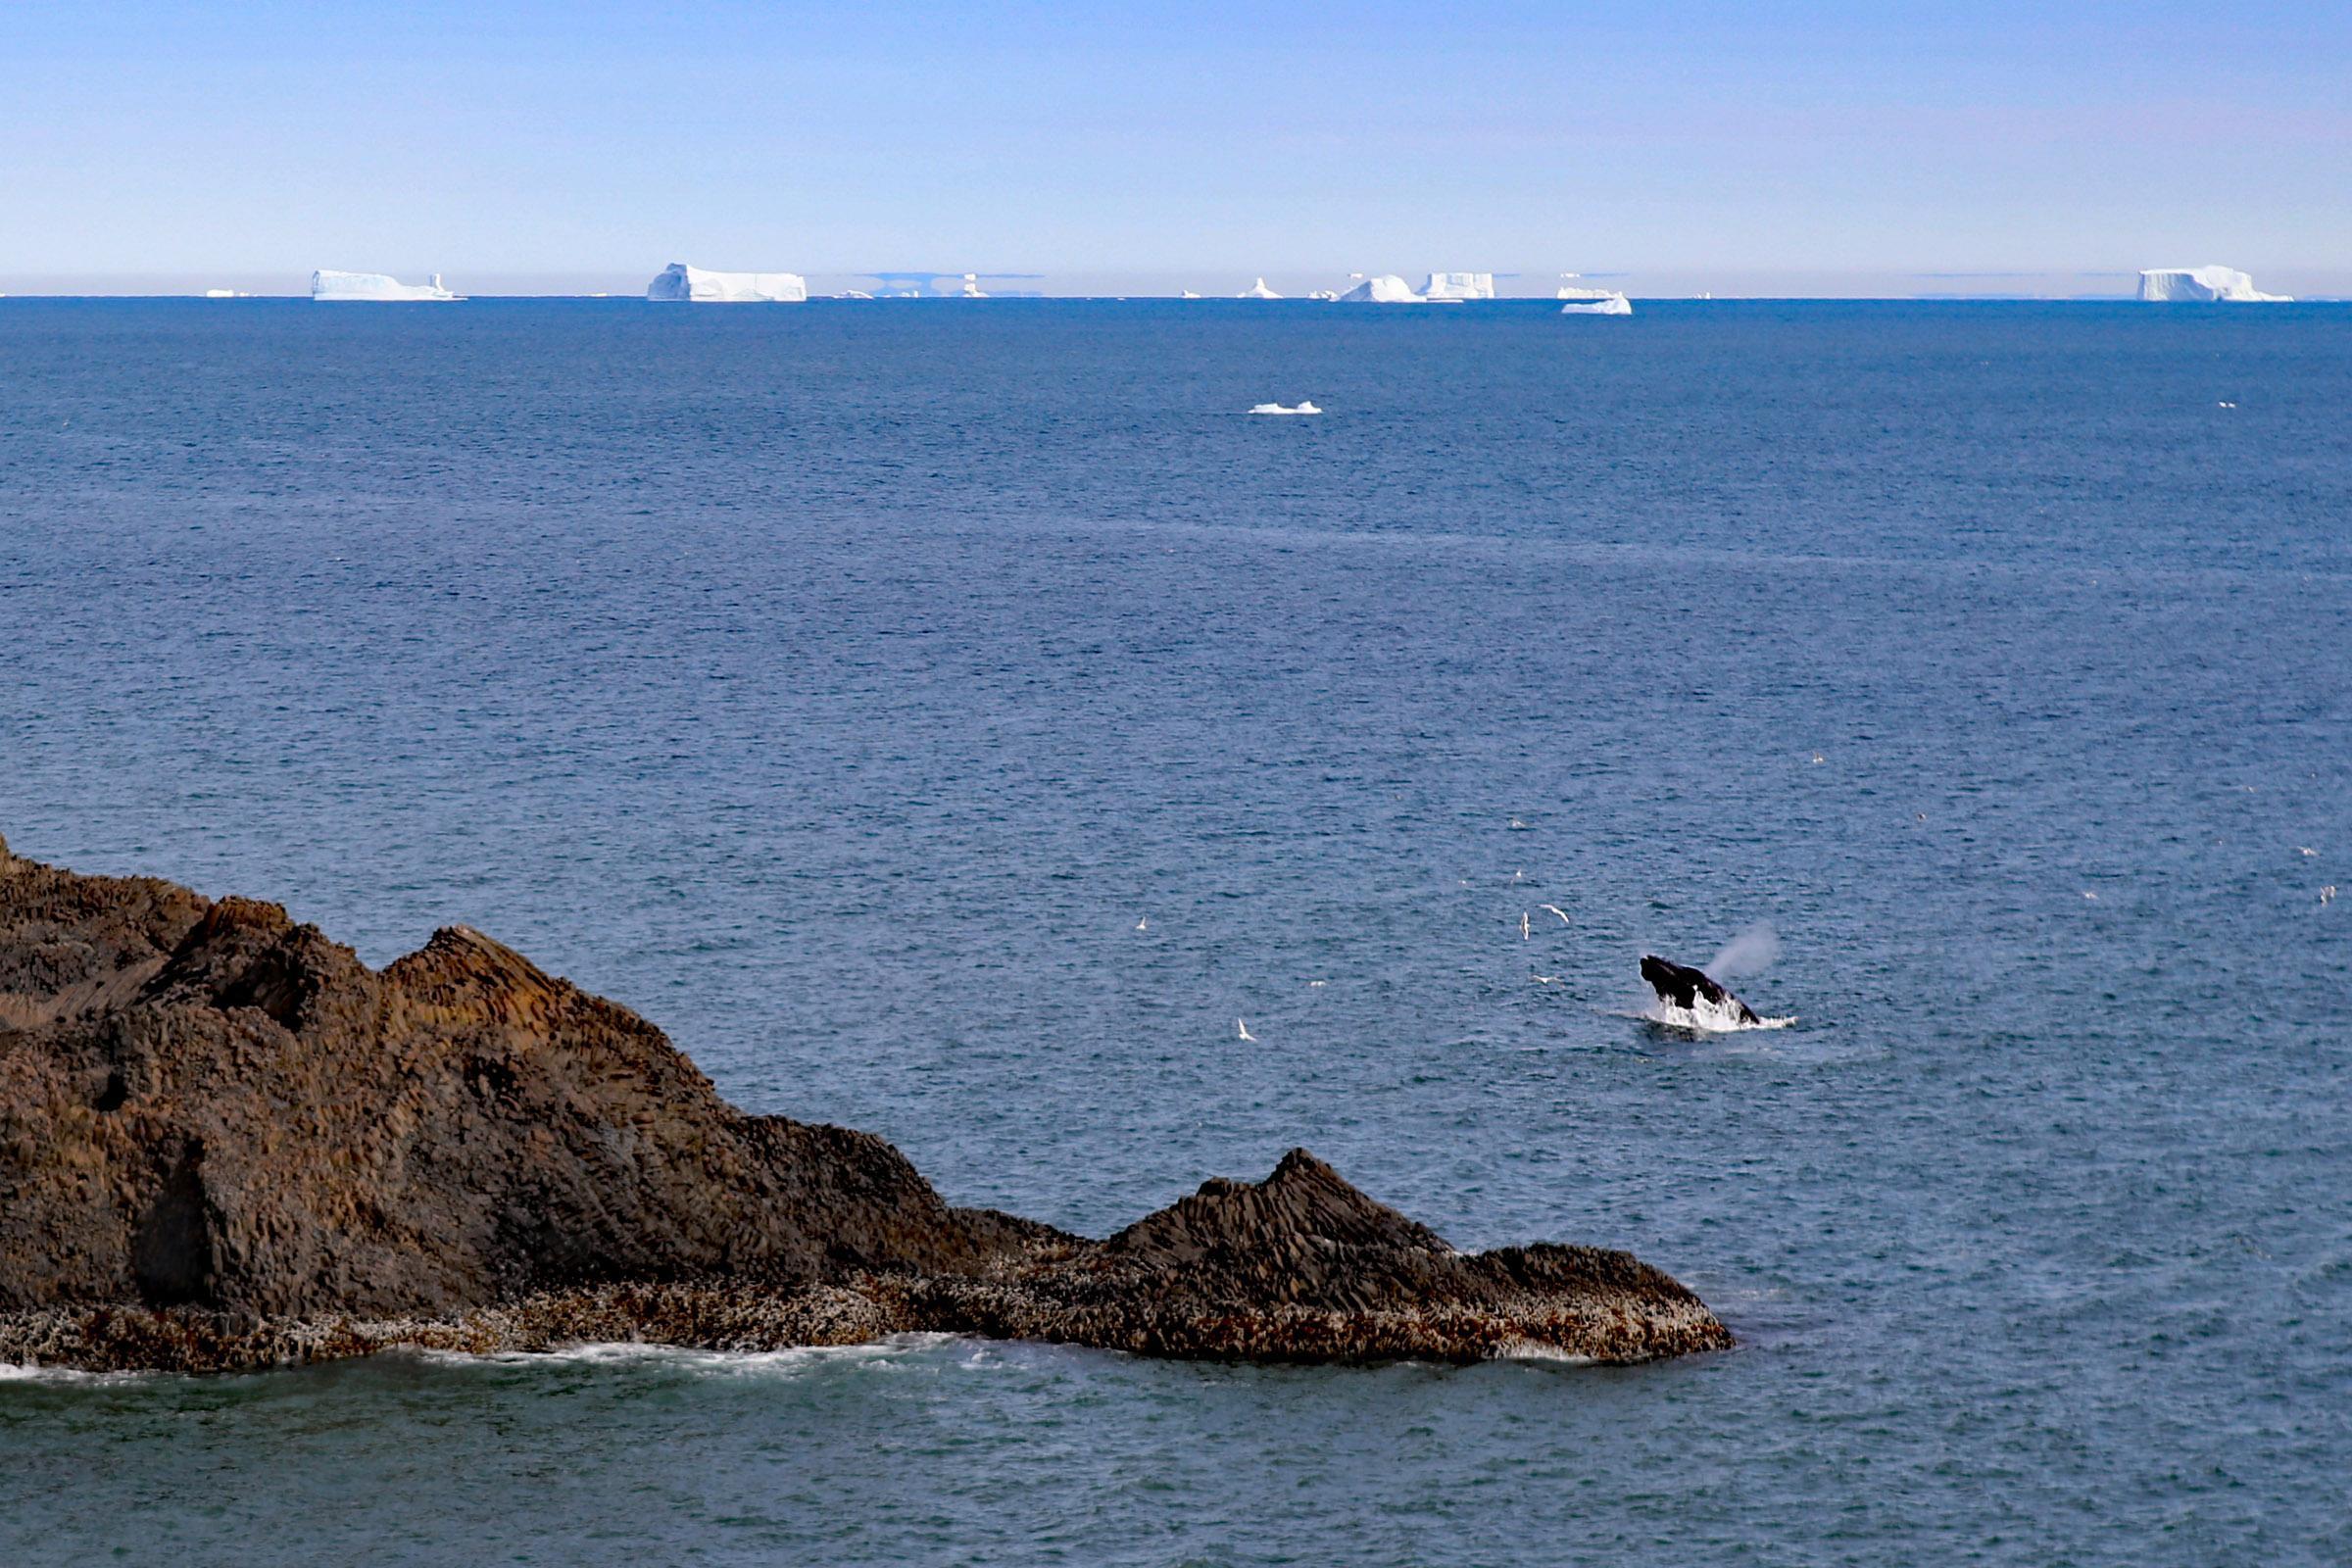 Whale watching from the shore in Qeqertarsuaq Greenland. Photo by Jurga Rubinovaite.